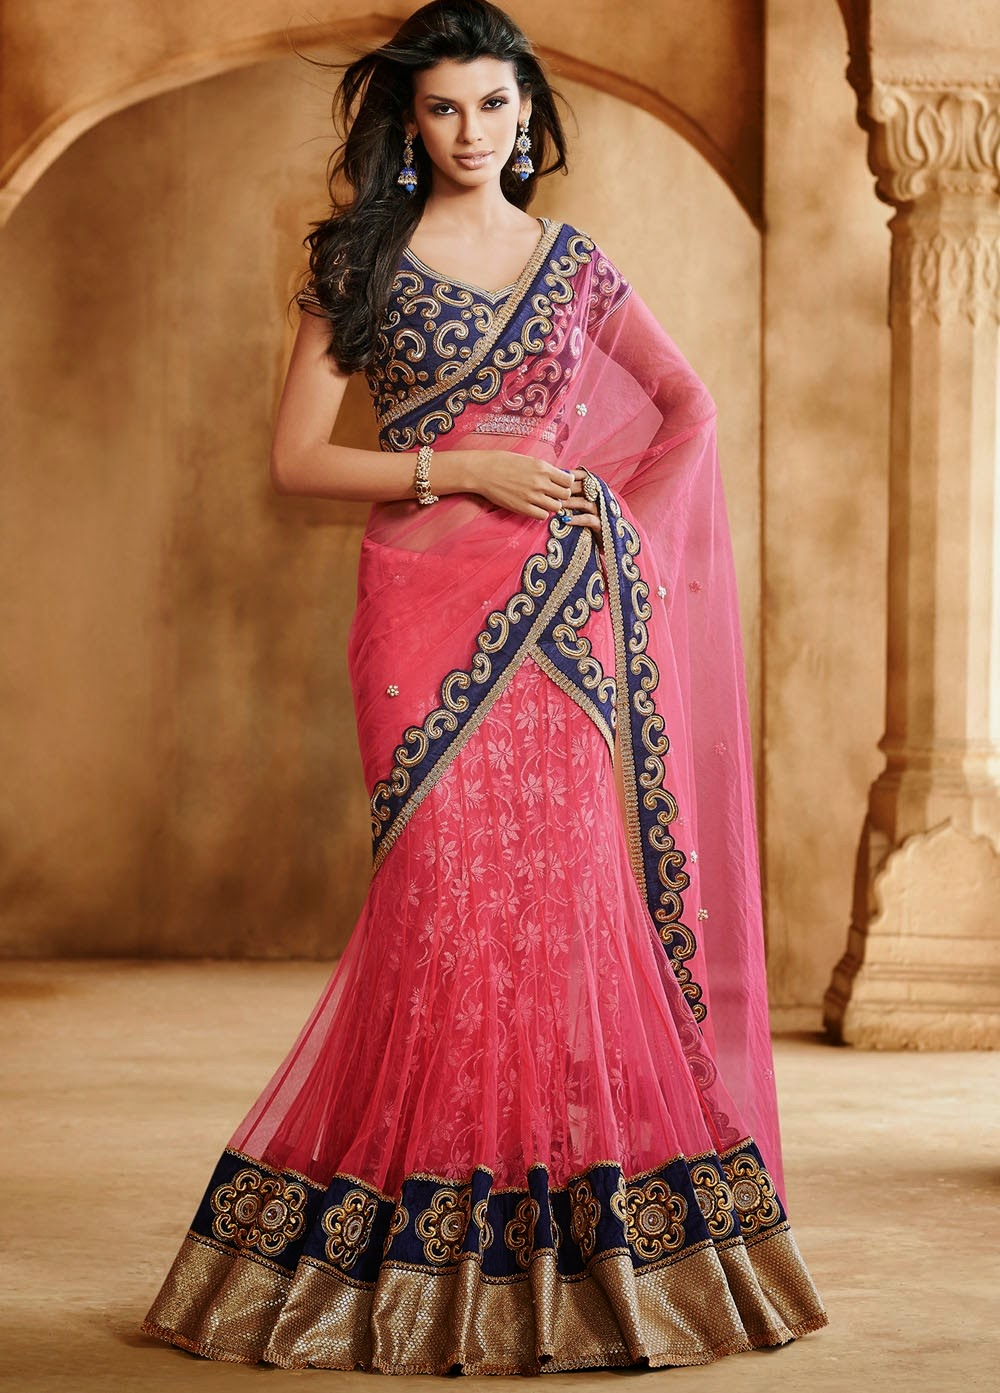 Outstanding Bridal Lehenga Choli and Lehenga Saree Designs ...